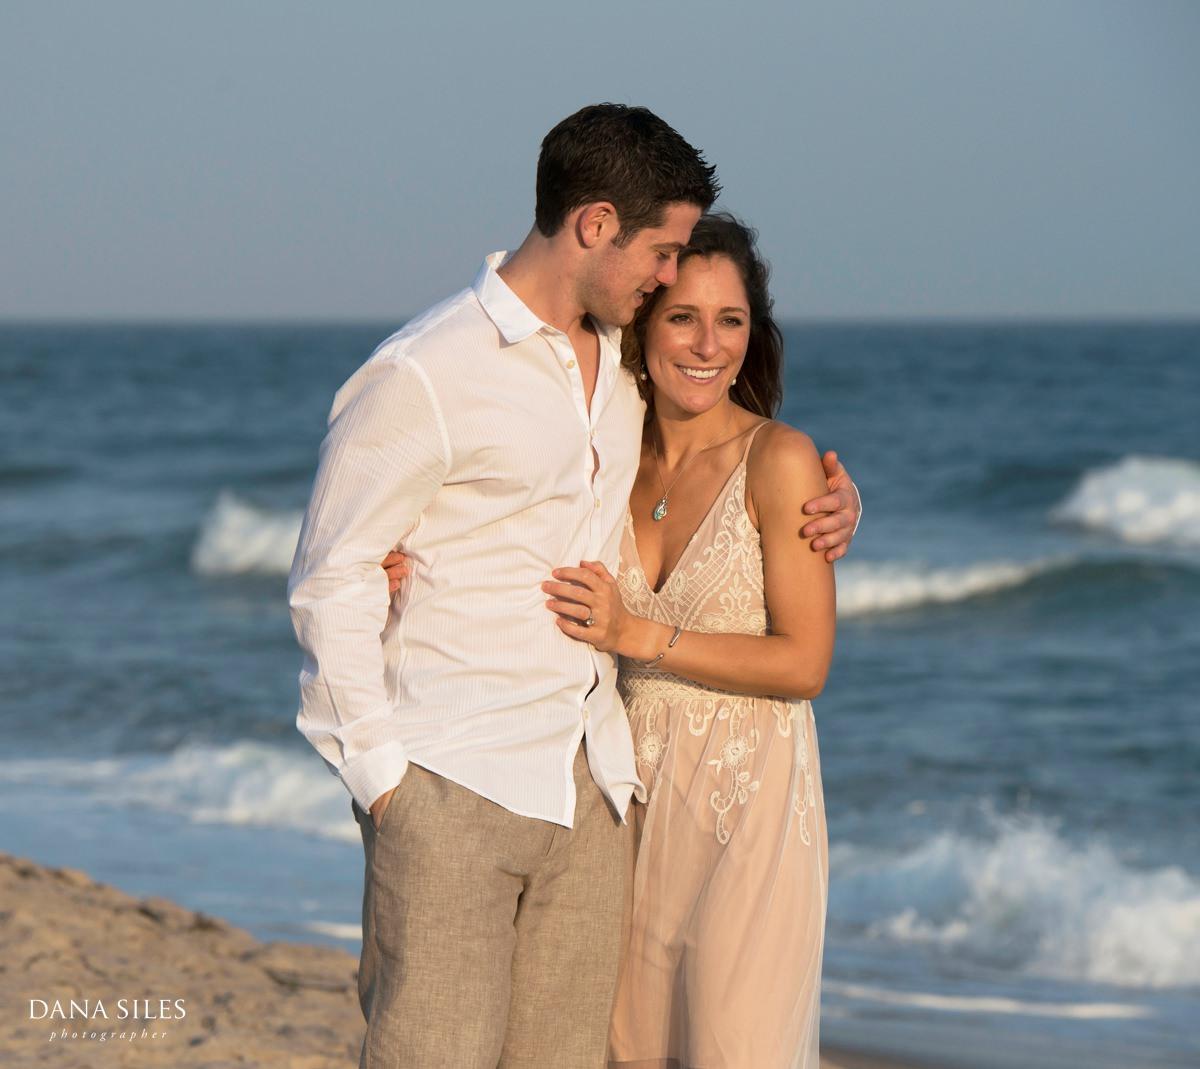 Engagement photography wakefield ri 16